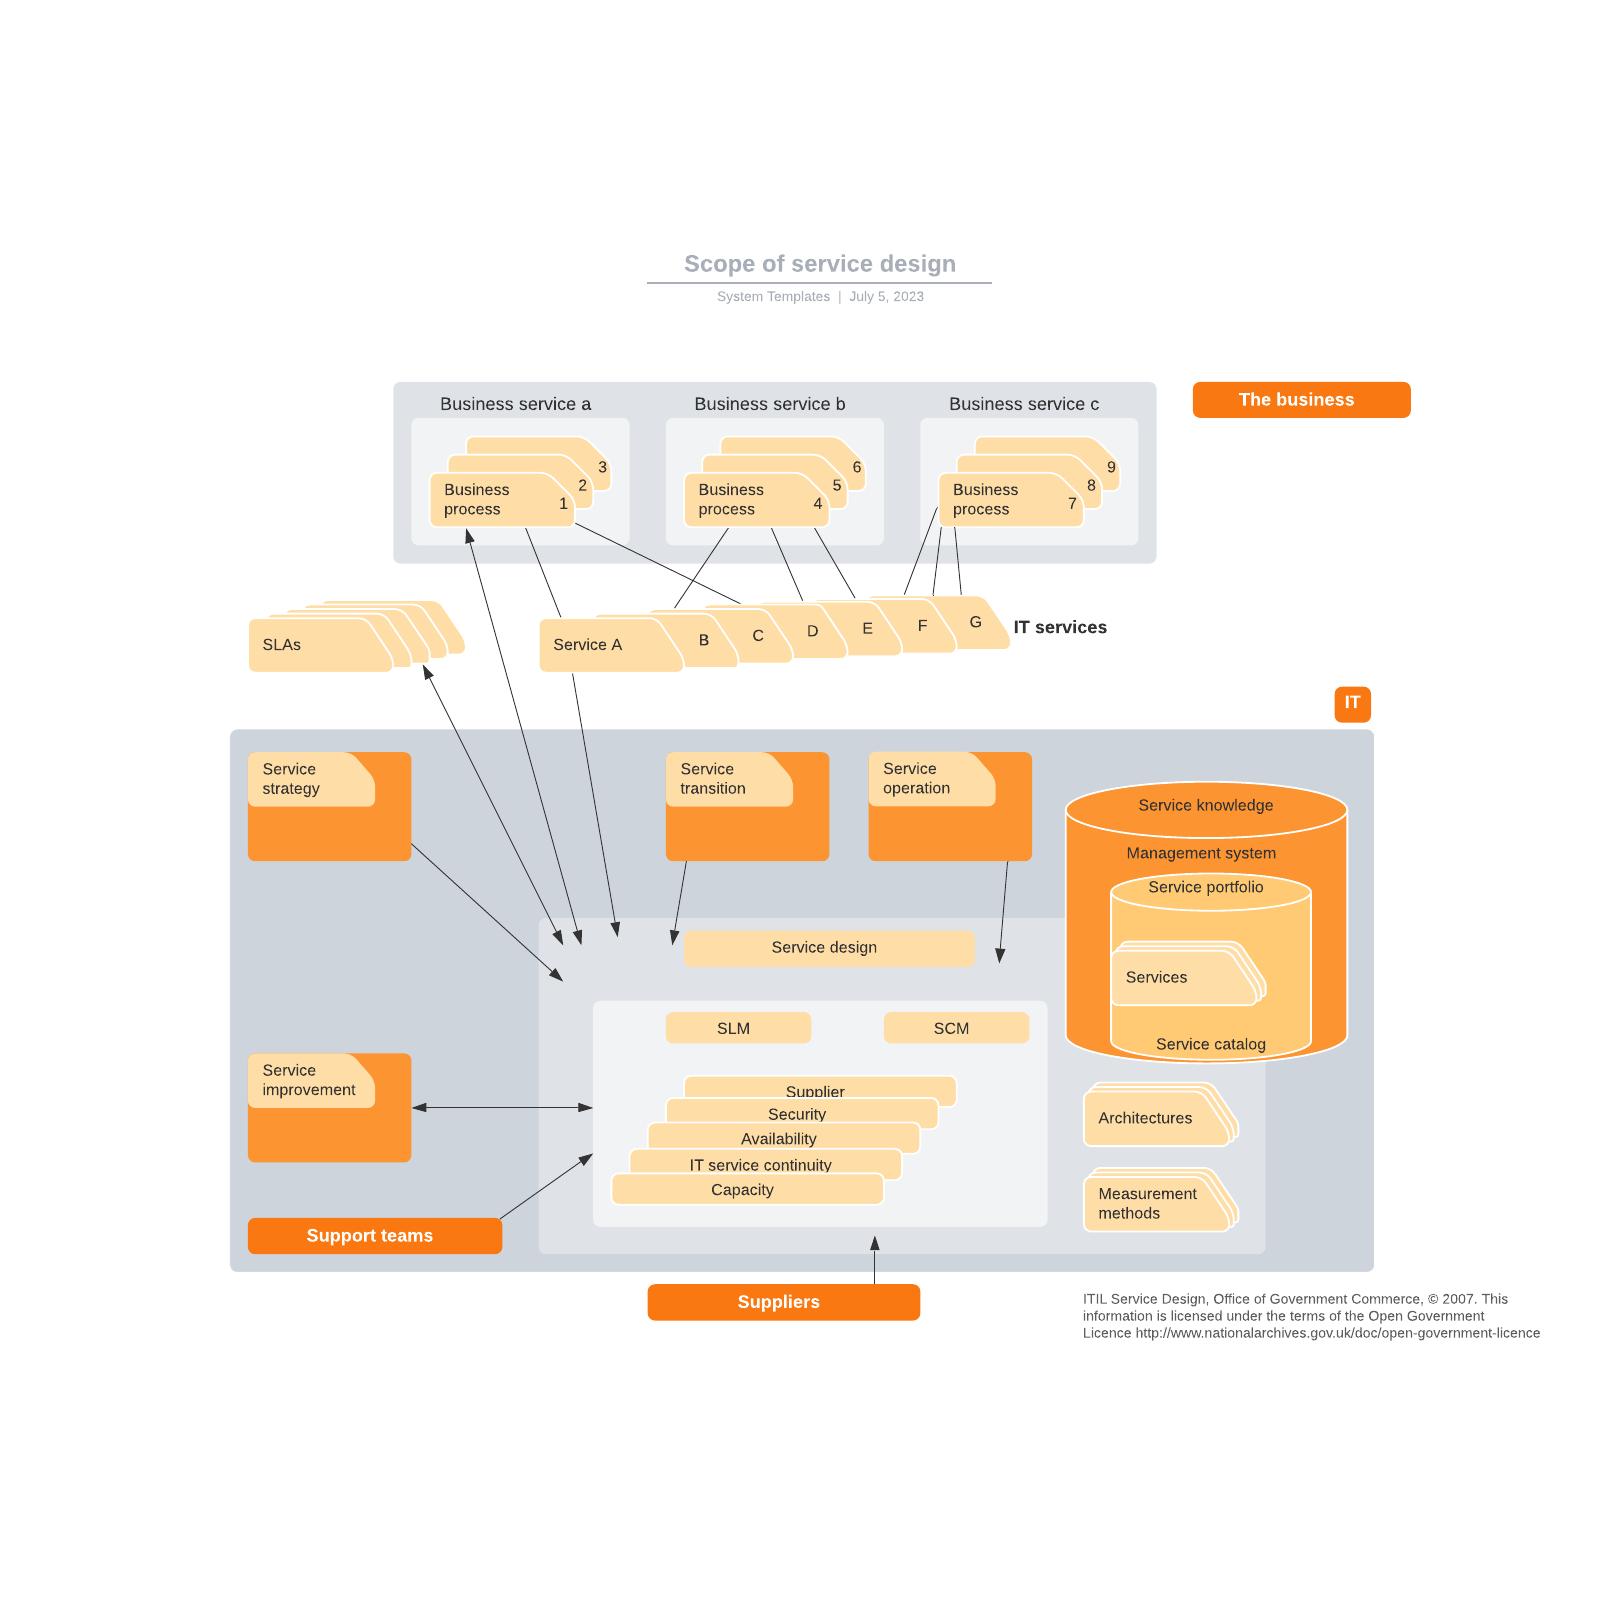 Scope of service design